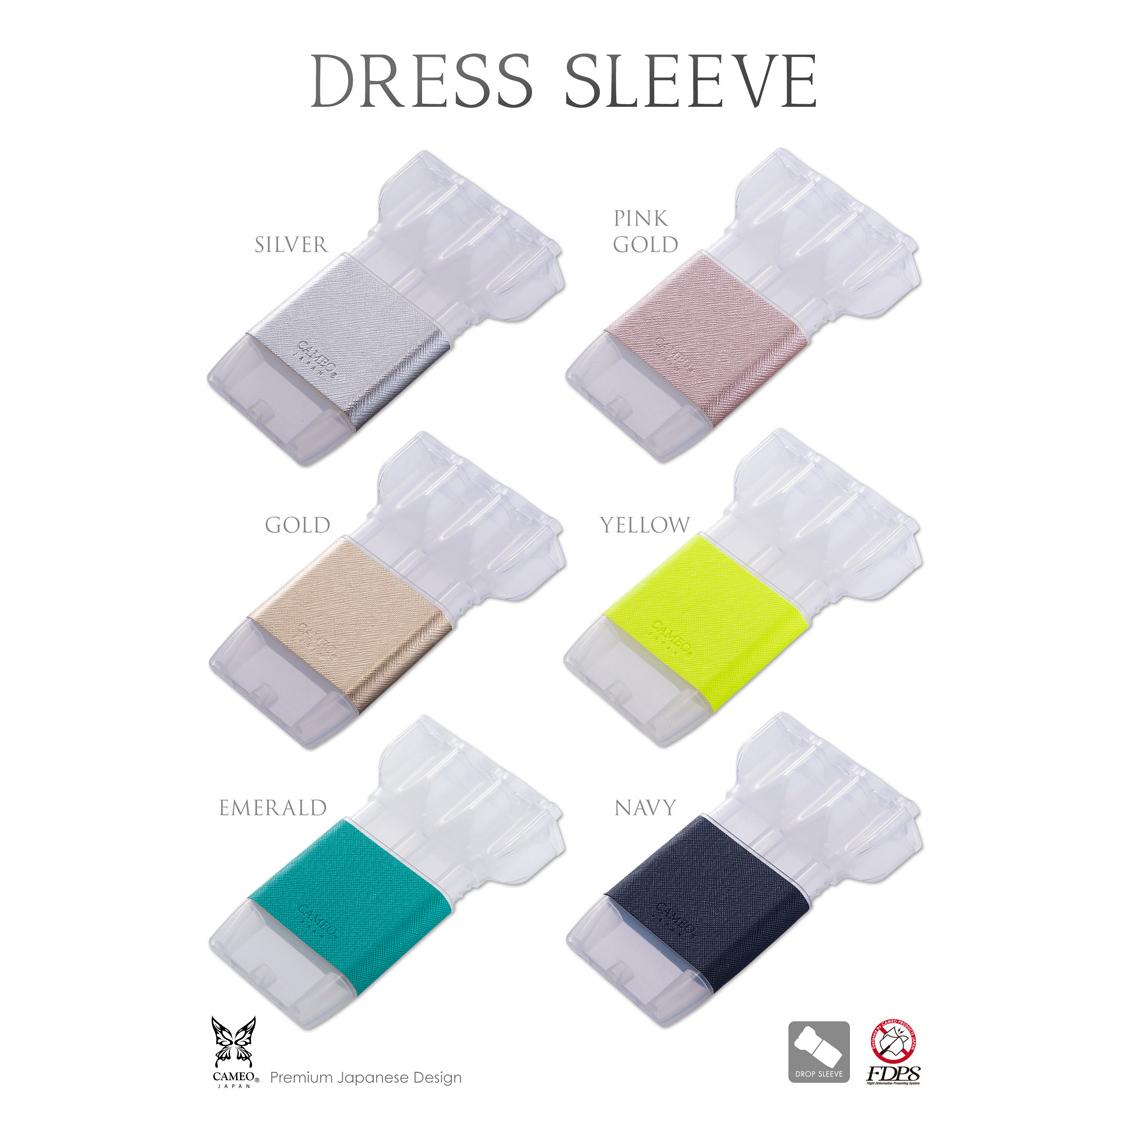 Cameo-DARTS-CASE-DRESS-SLEEVE-CLEAR